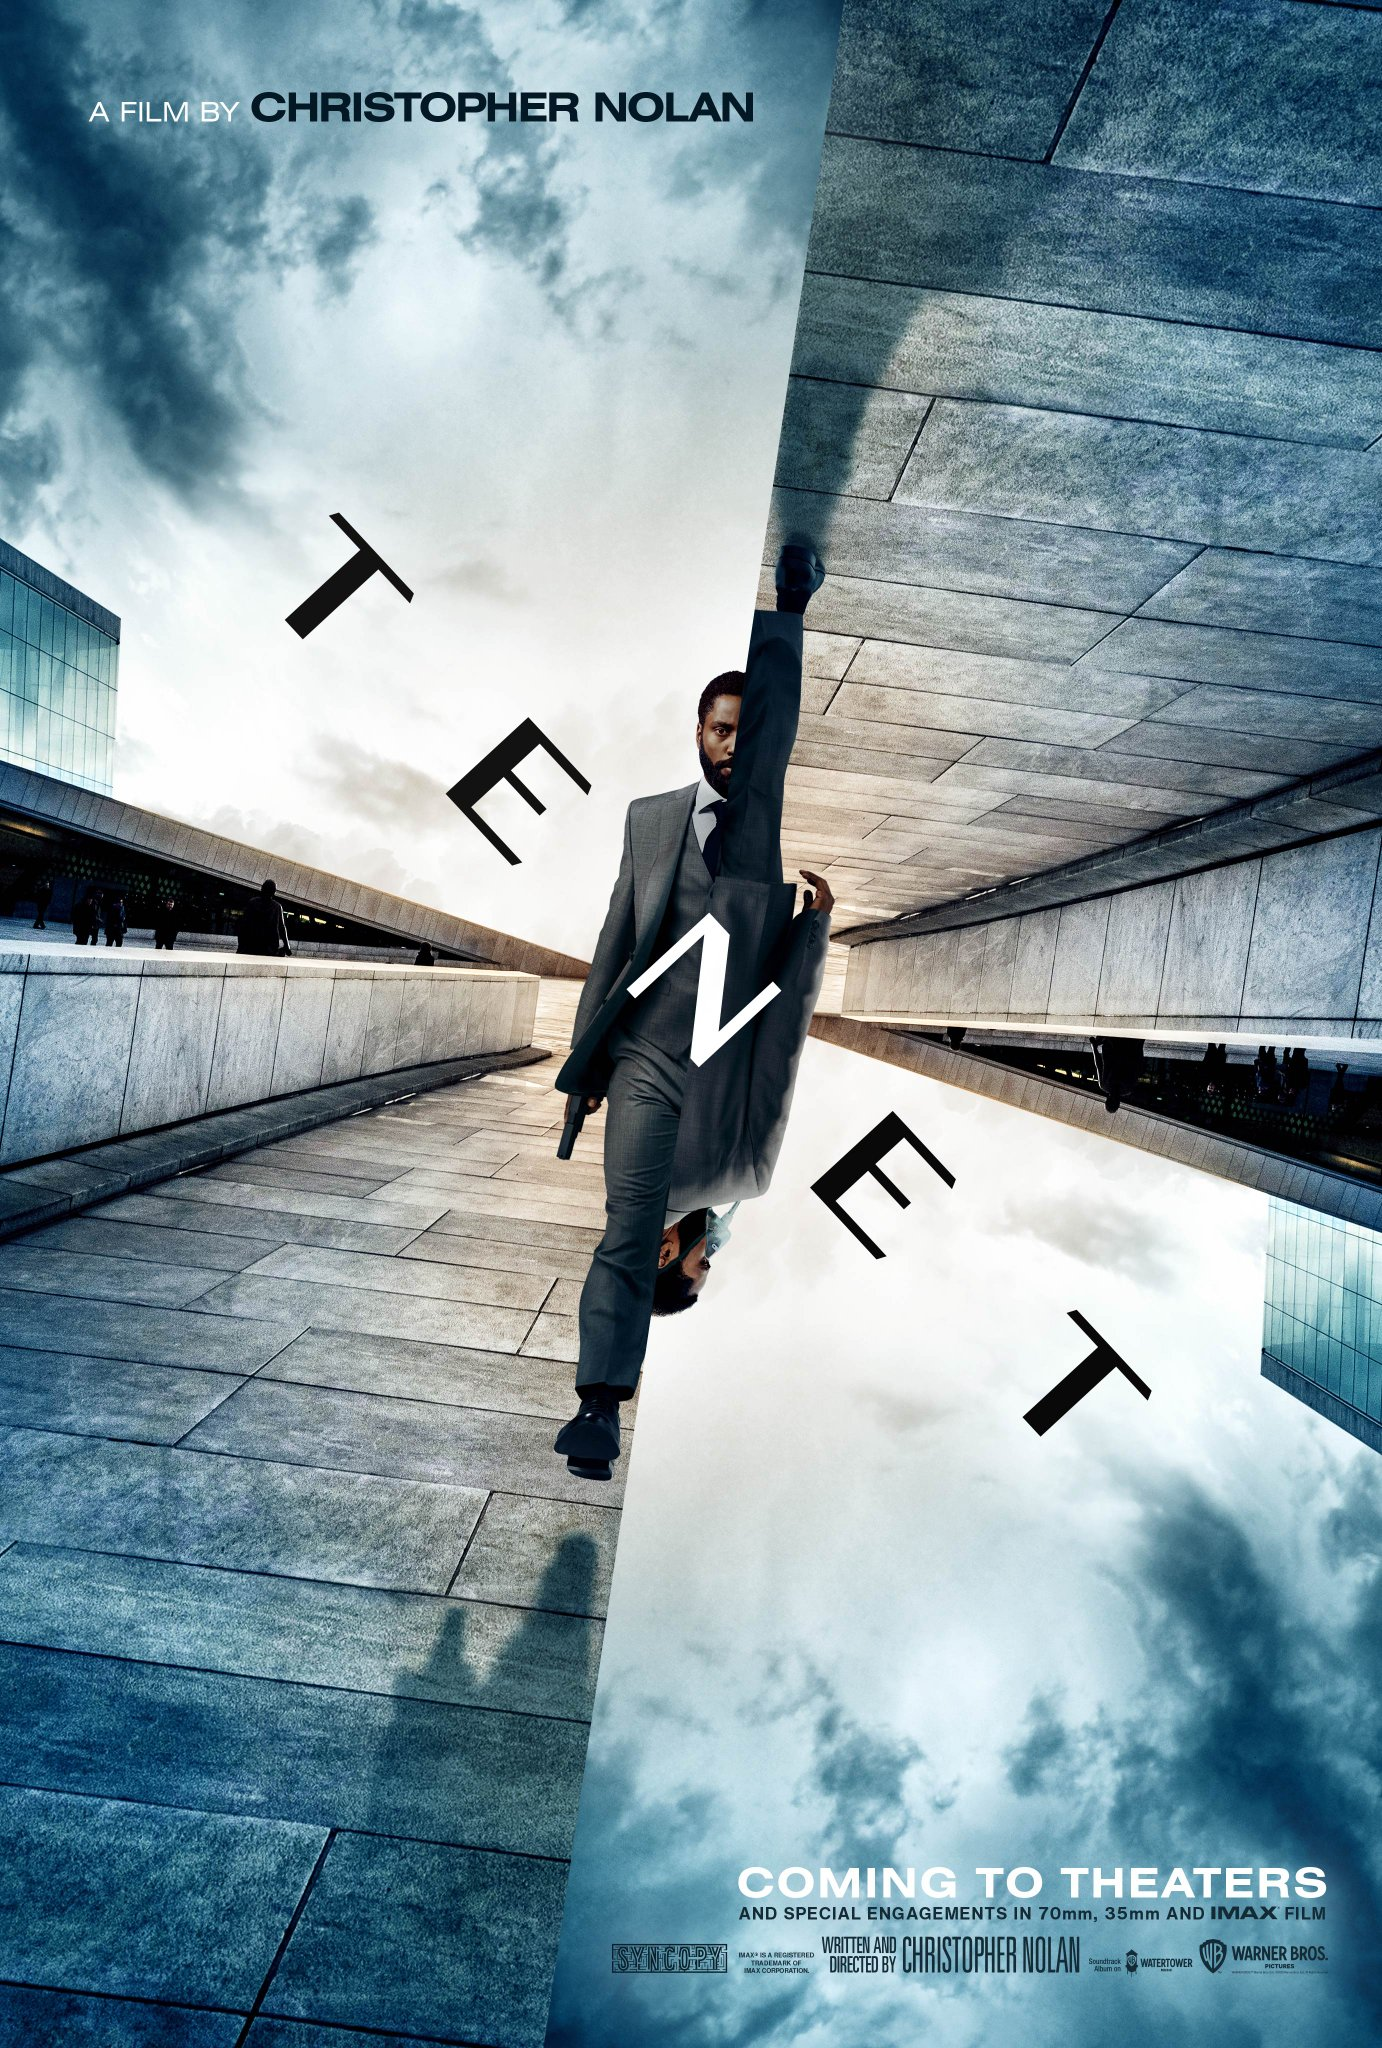 Christopher Nolan Unleashes New Tenet Trailer: Watch